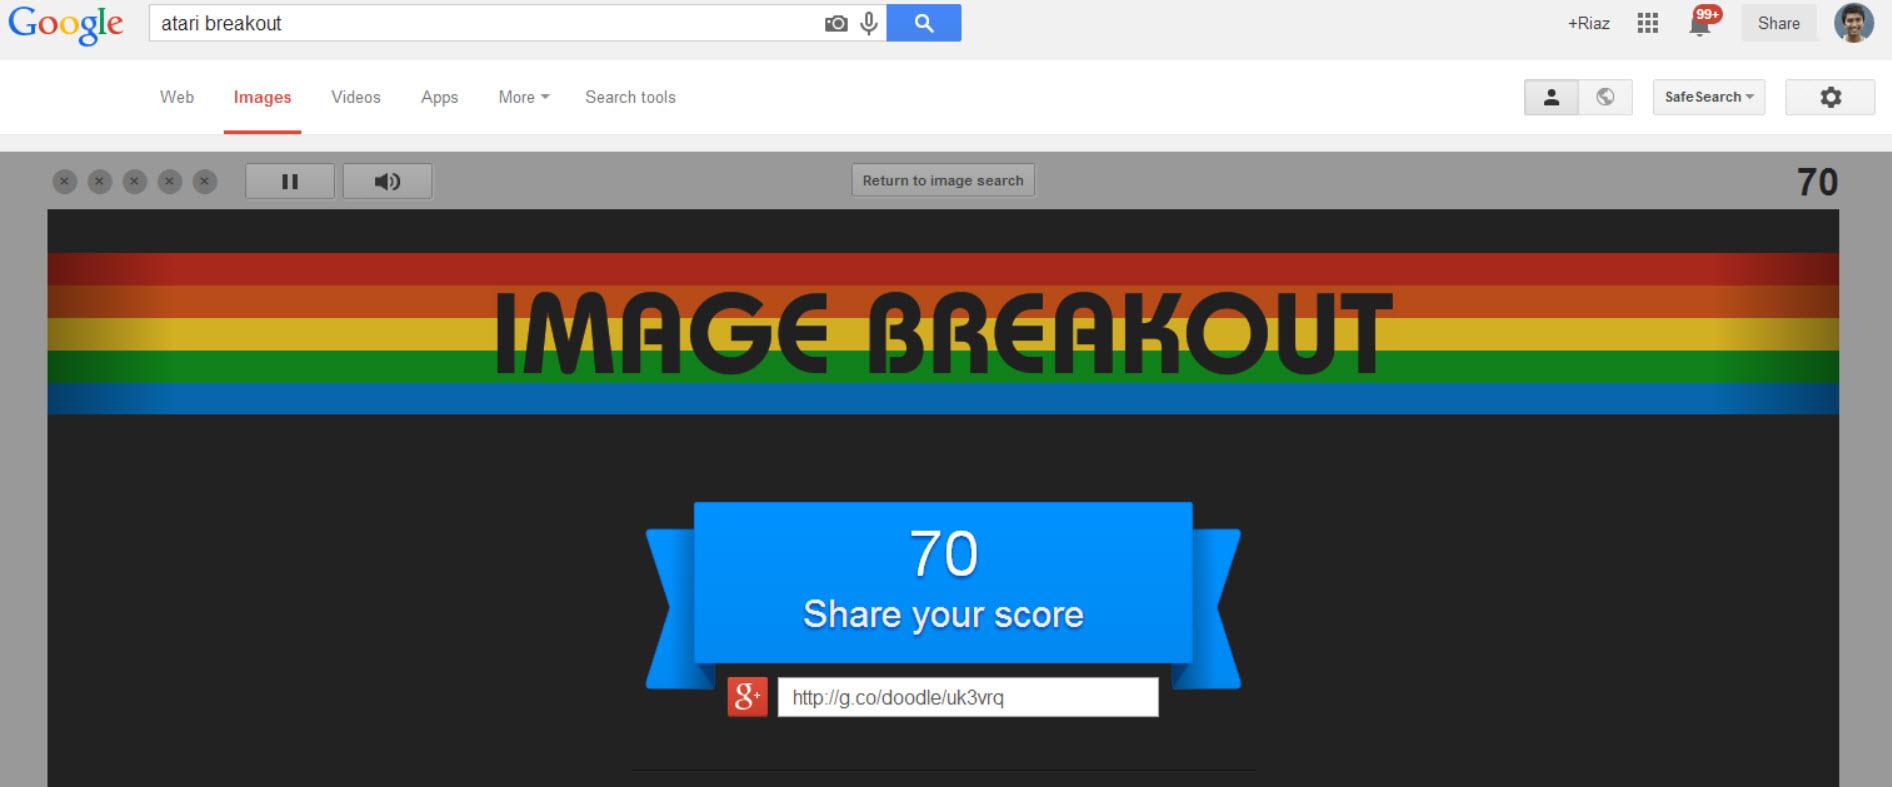 high score atari breakout